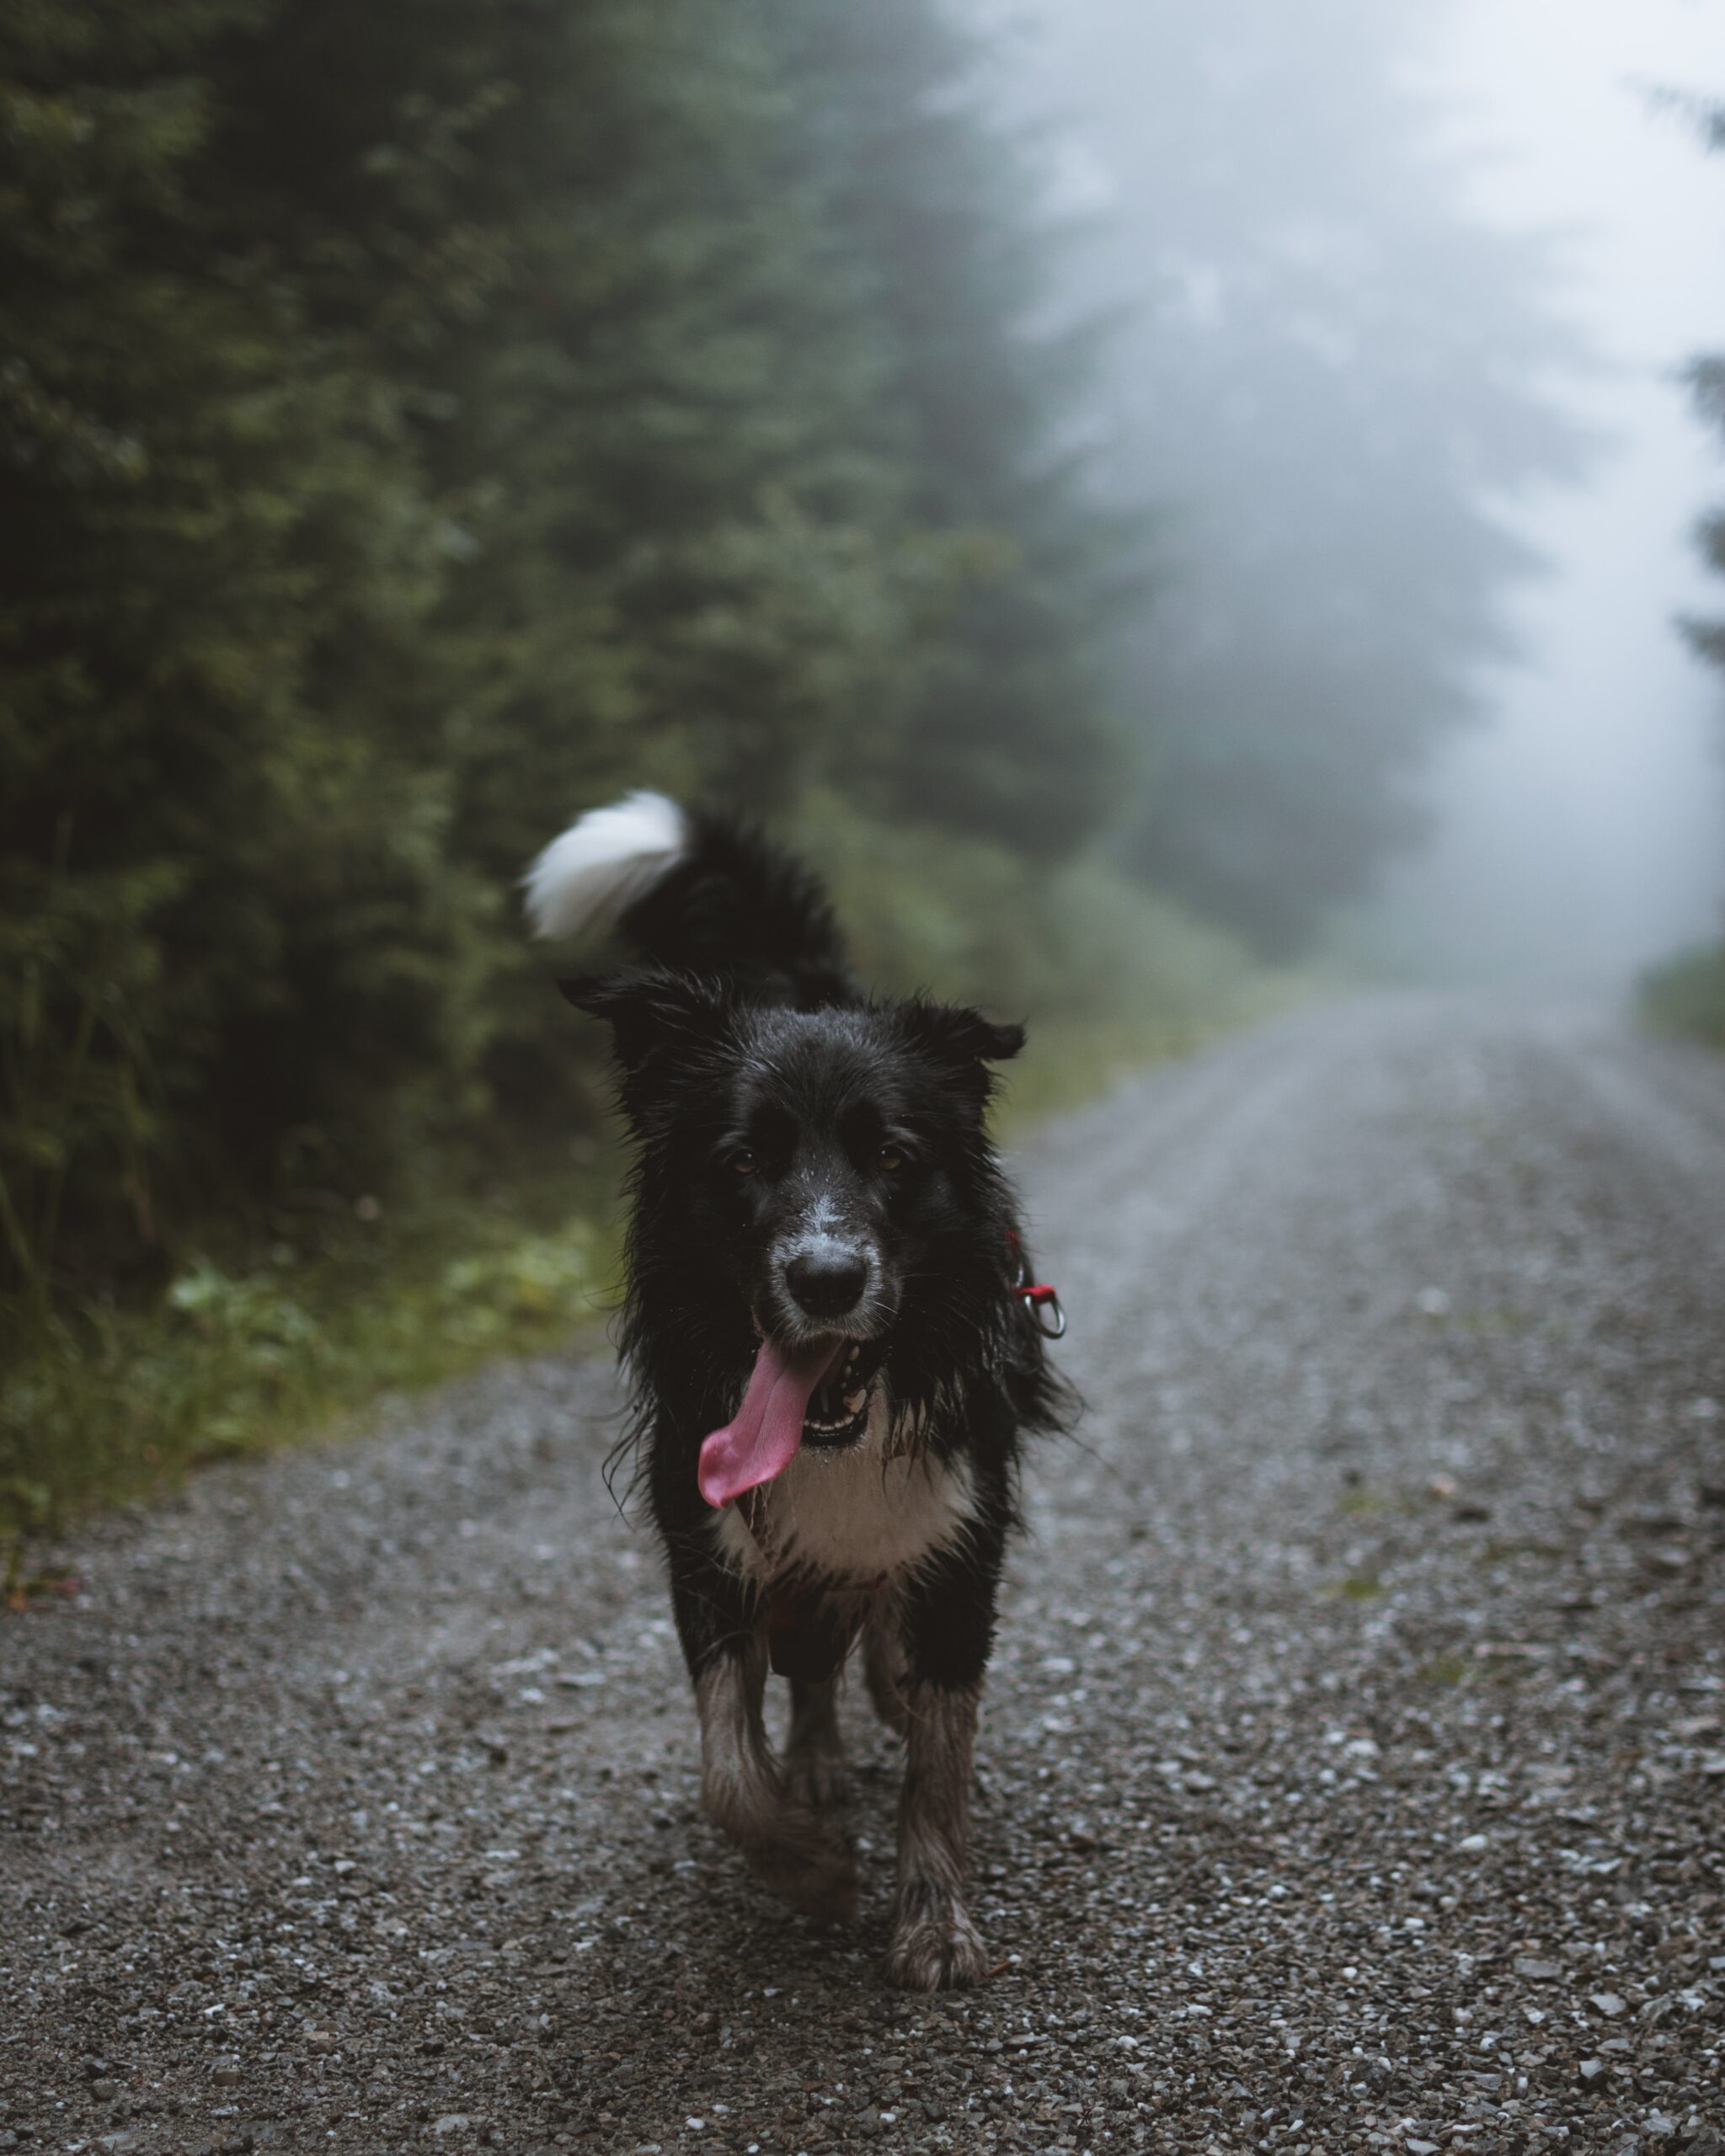 tadeusz-Wet border collie mut running on dirt road-unsplash